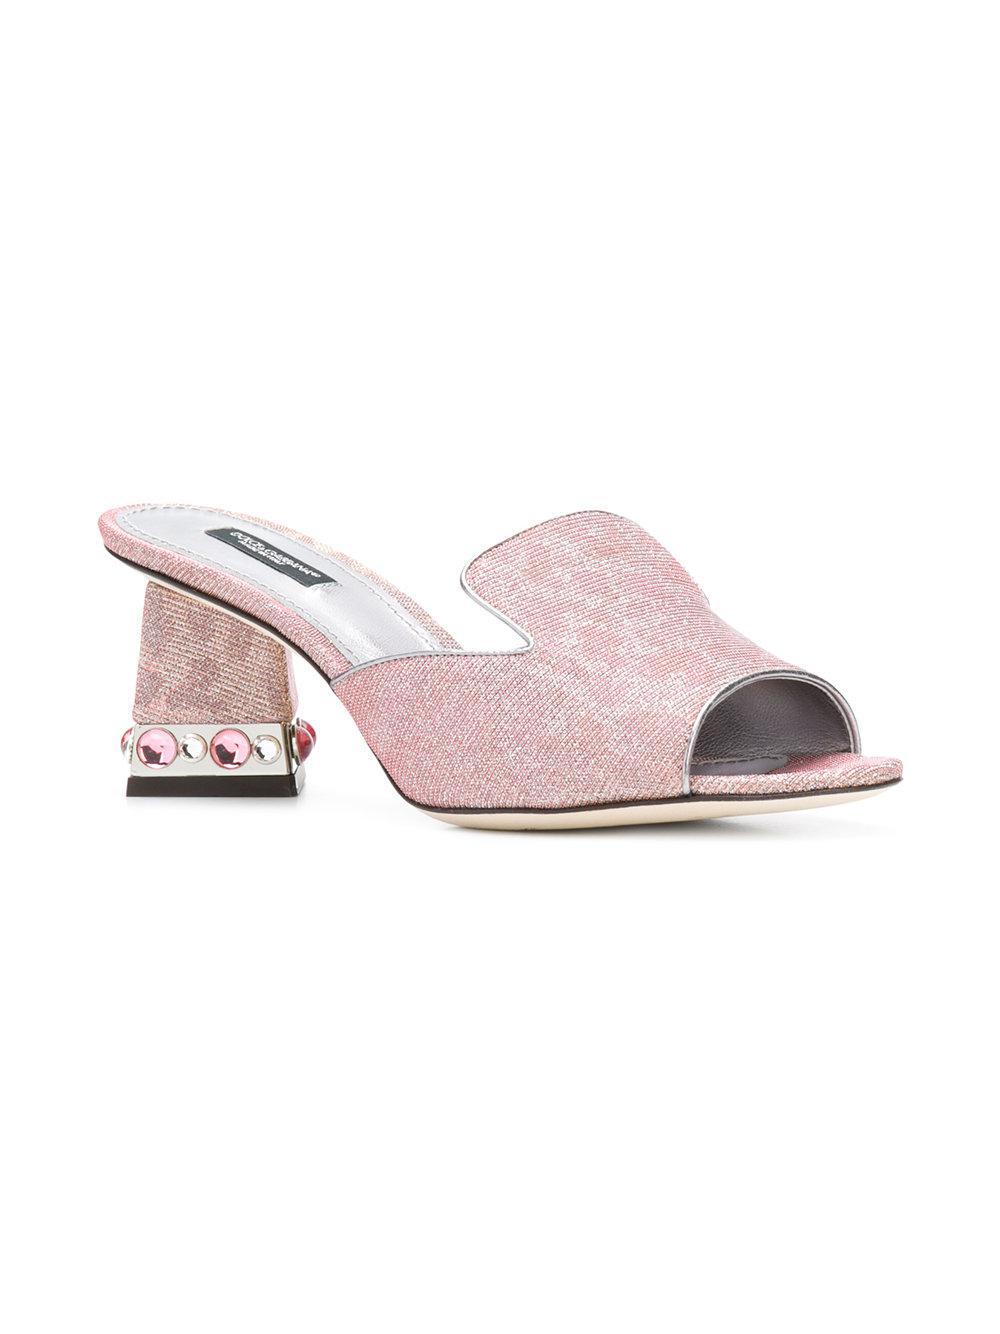 Dolce & Gabbana Leo glitter open toe mules cZsy3uNsx